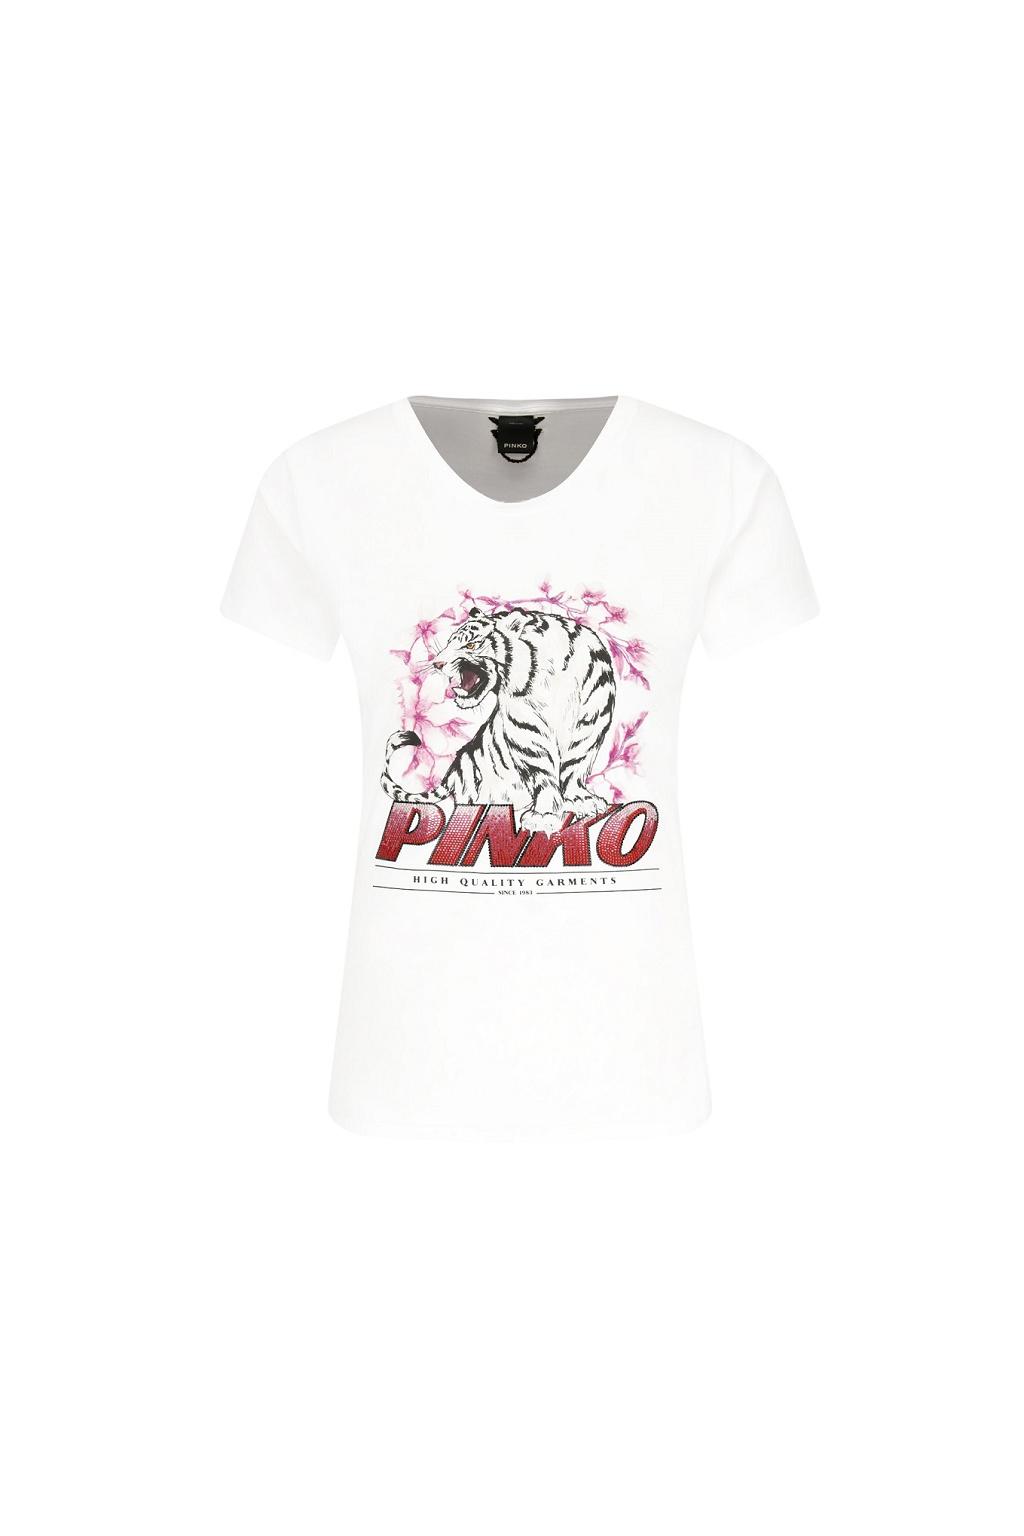 1B14J3 WOY1 Dámské tričko Pinko Pimpi bílé